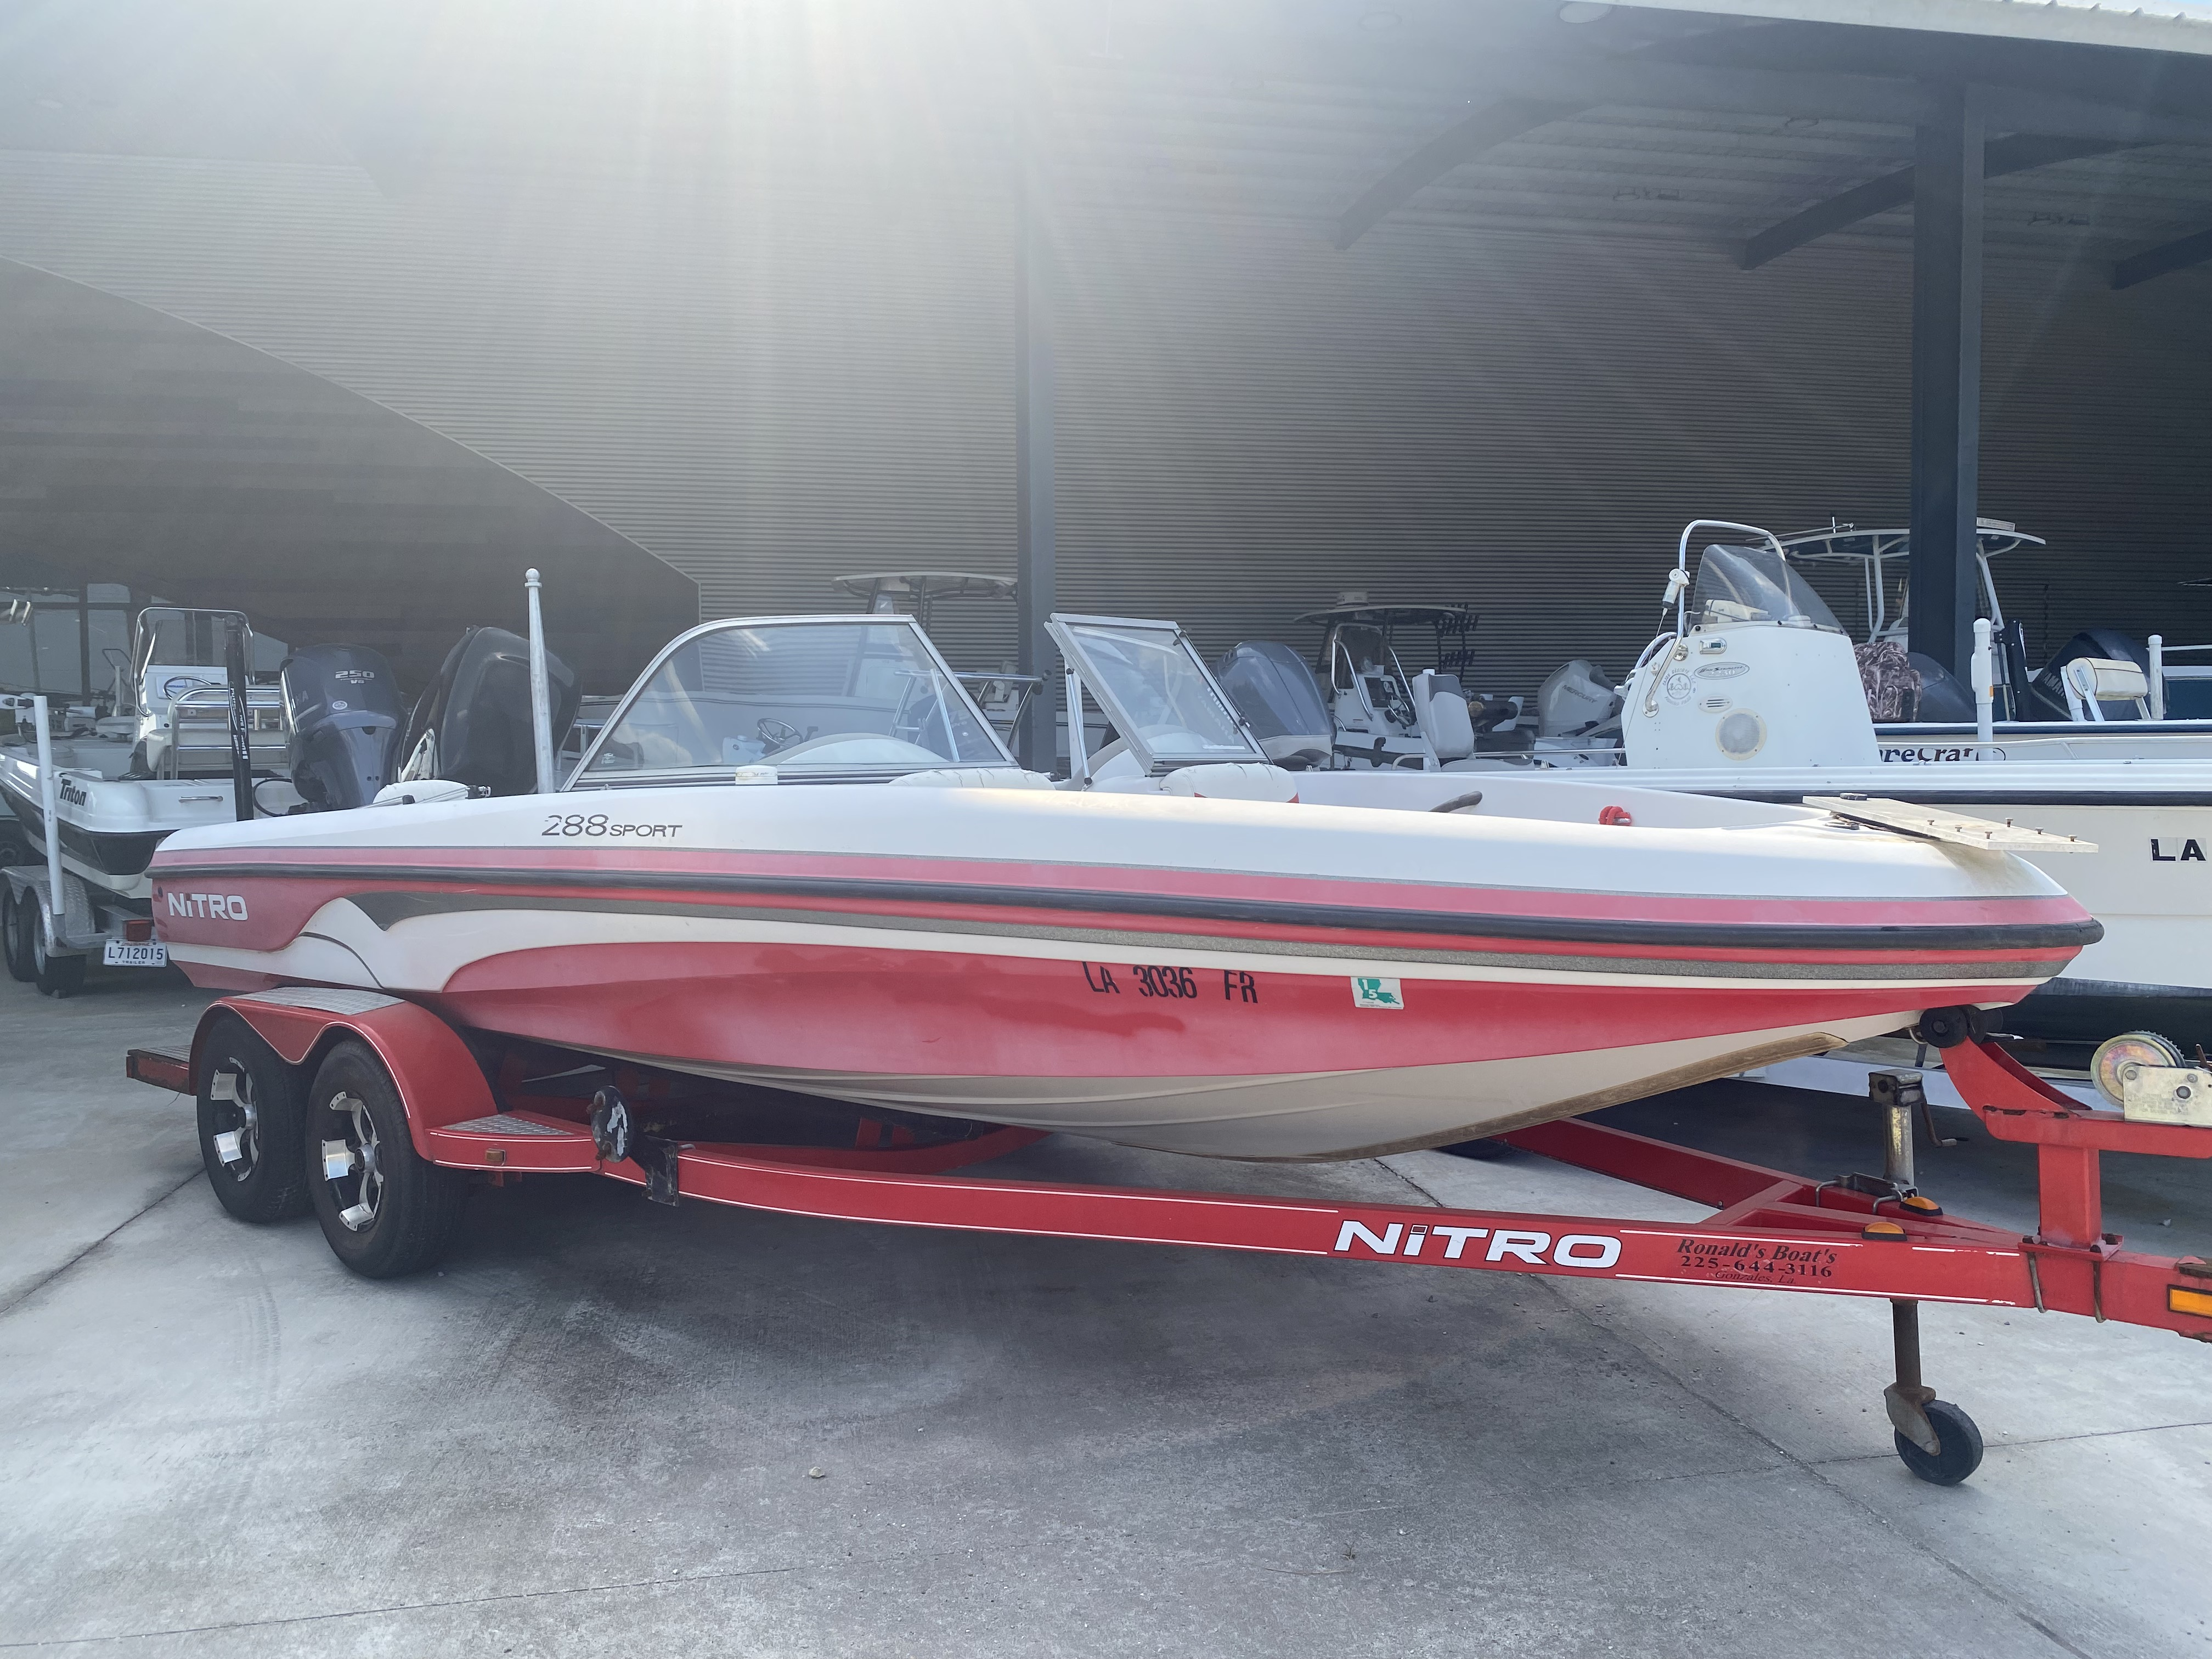 2007 NITRO 288 SPORT for sale